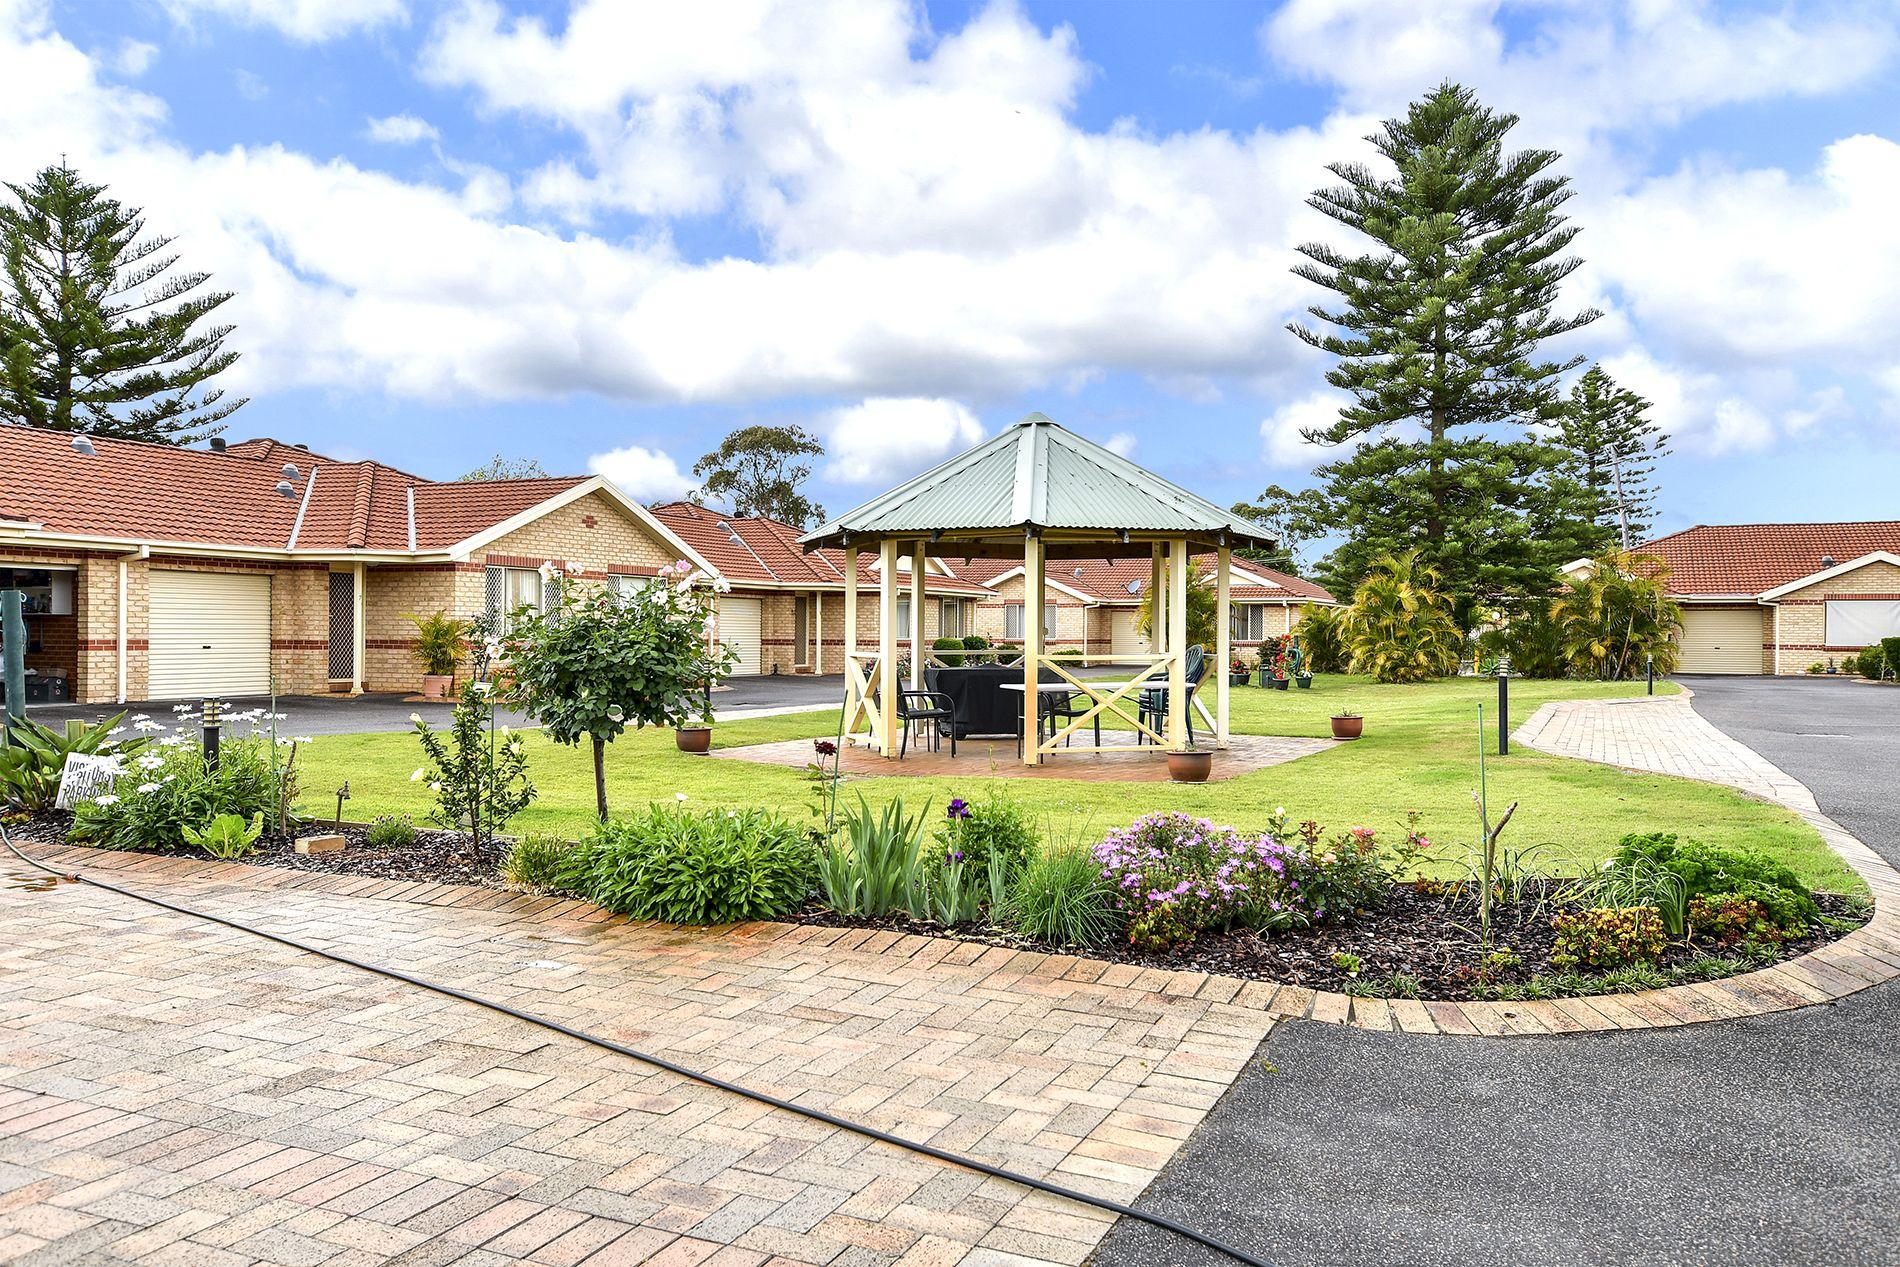 Real Estate For Sale - 3/36-42 Pratley Street - Woy Woy , NSW